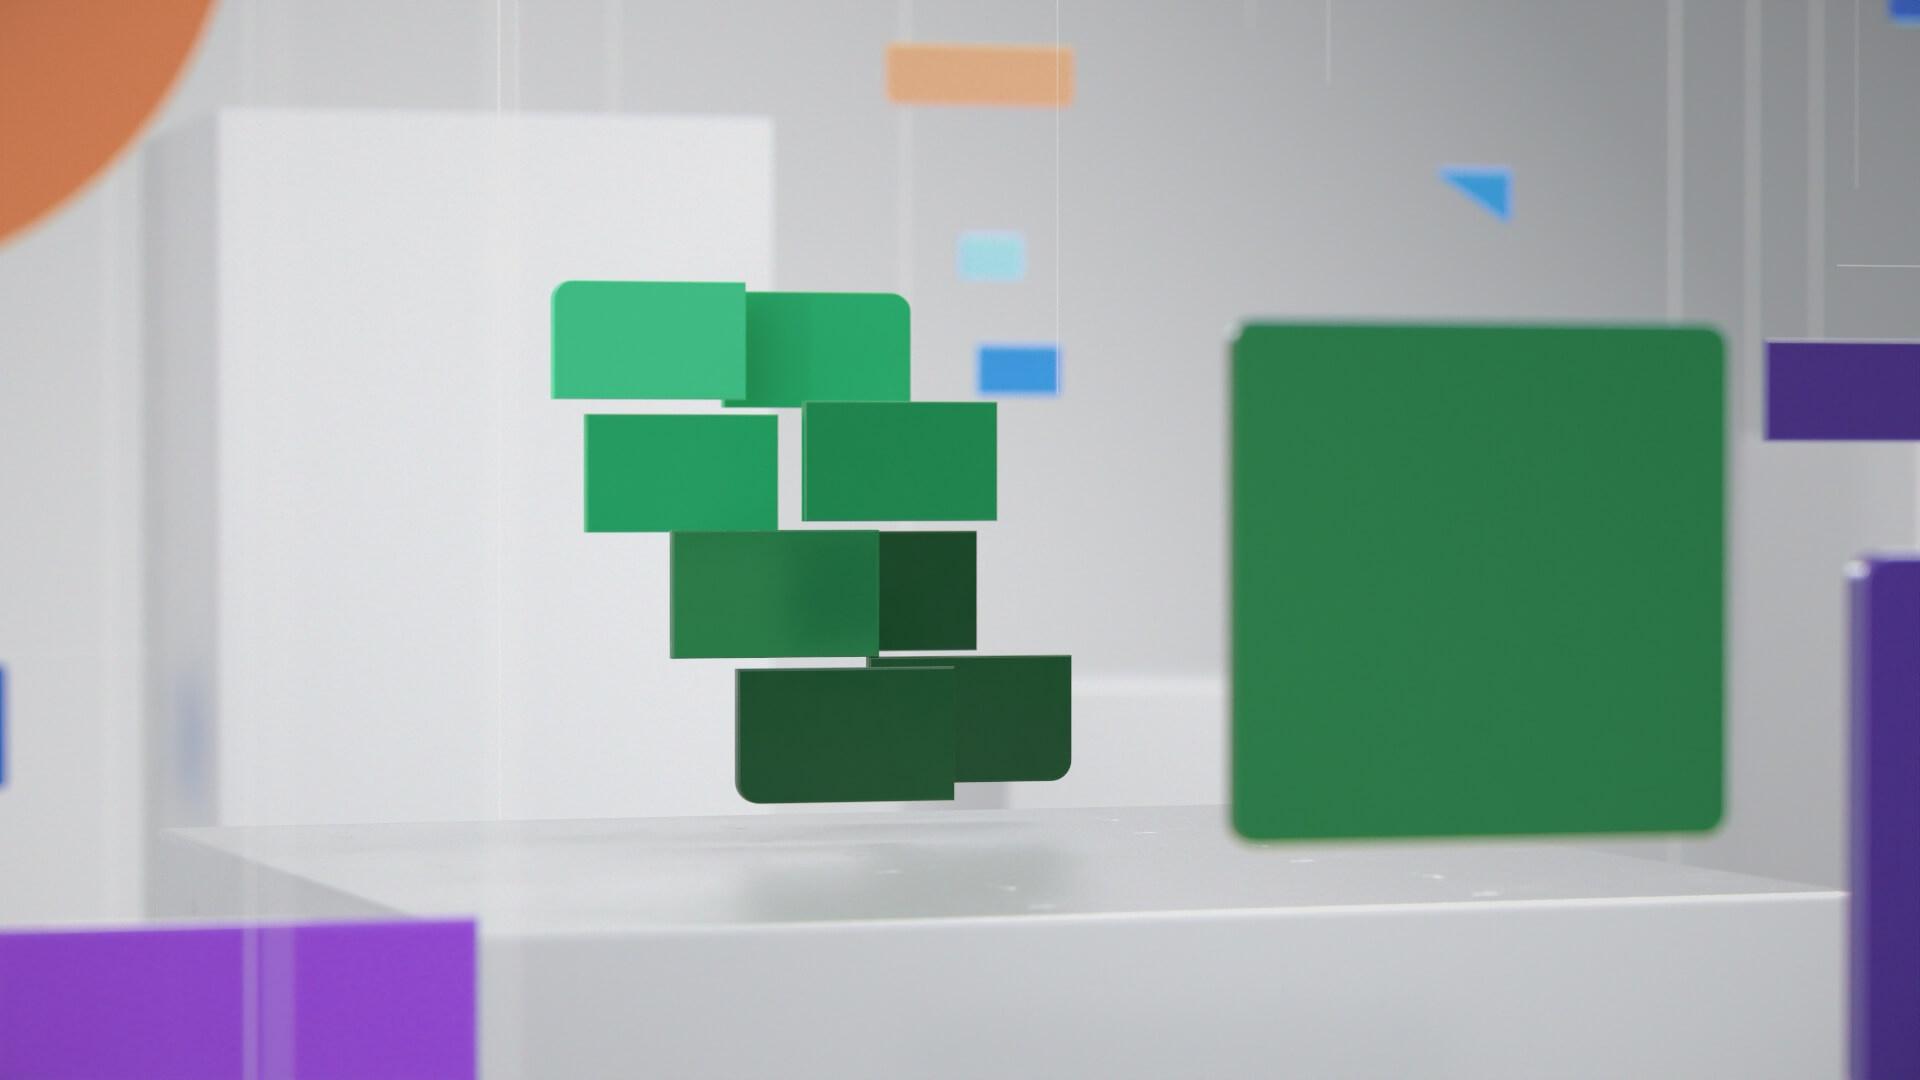 Excel free wallpaper